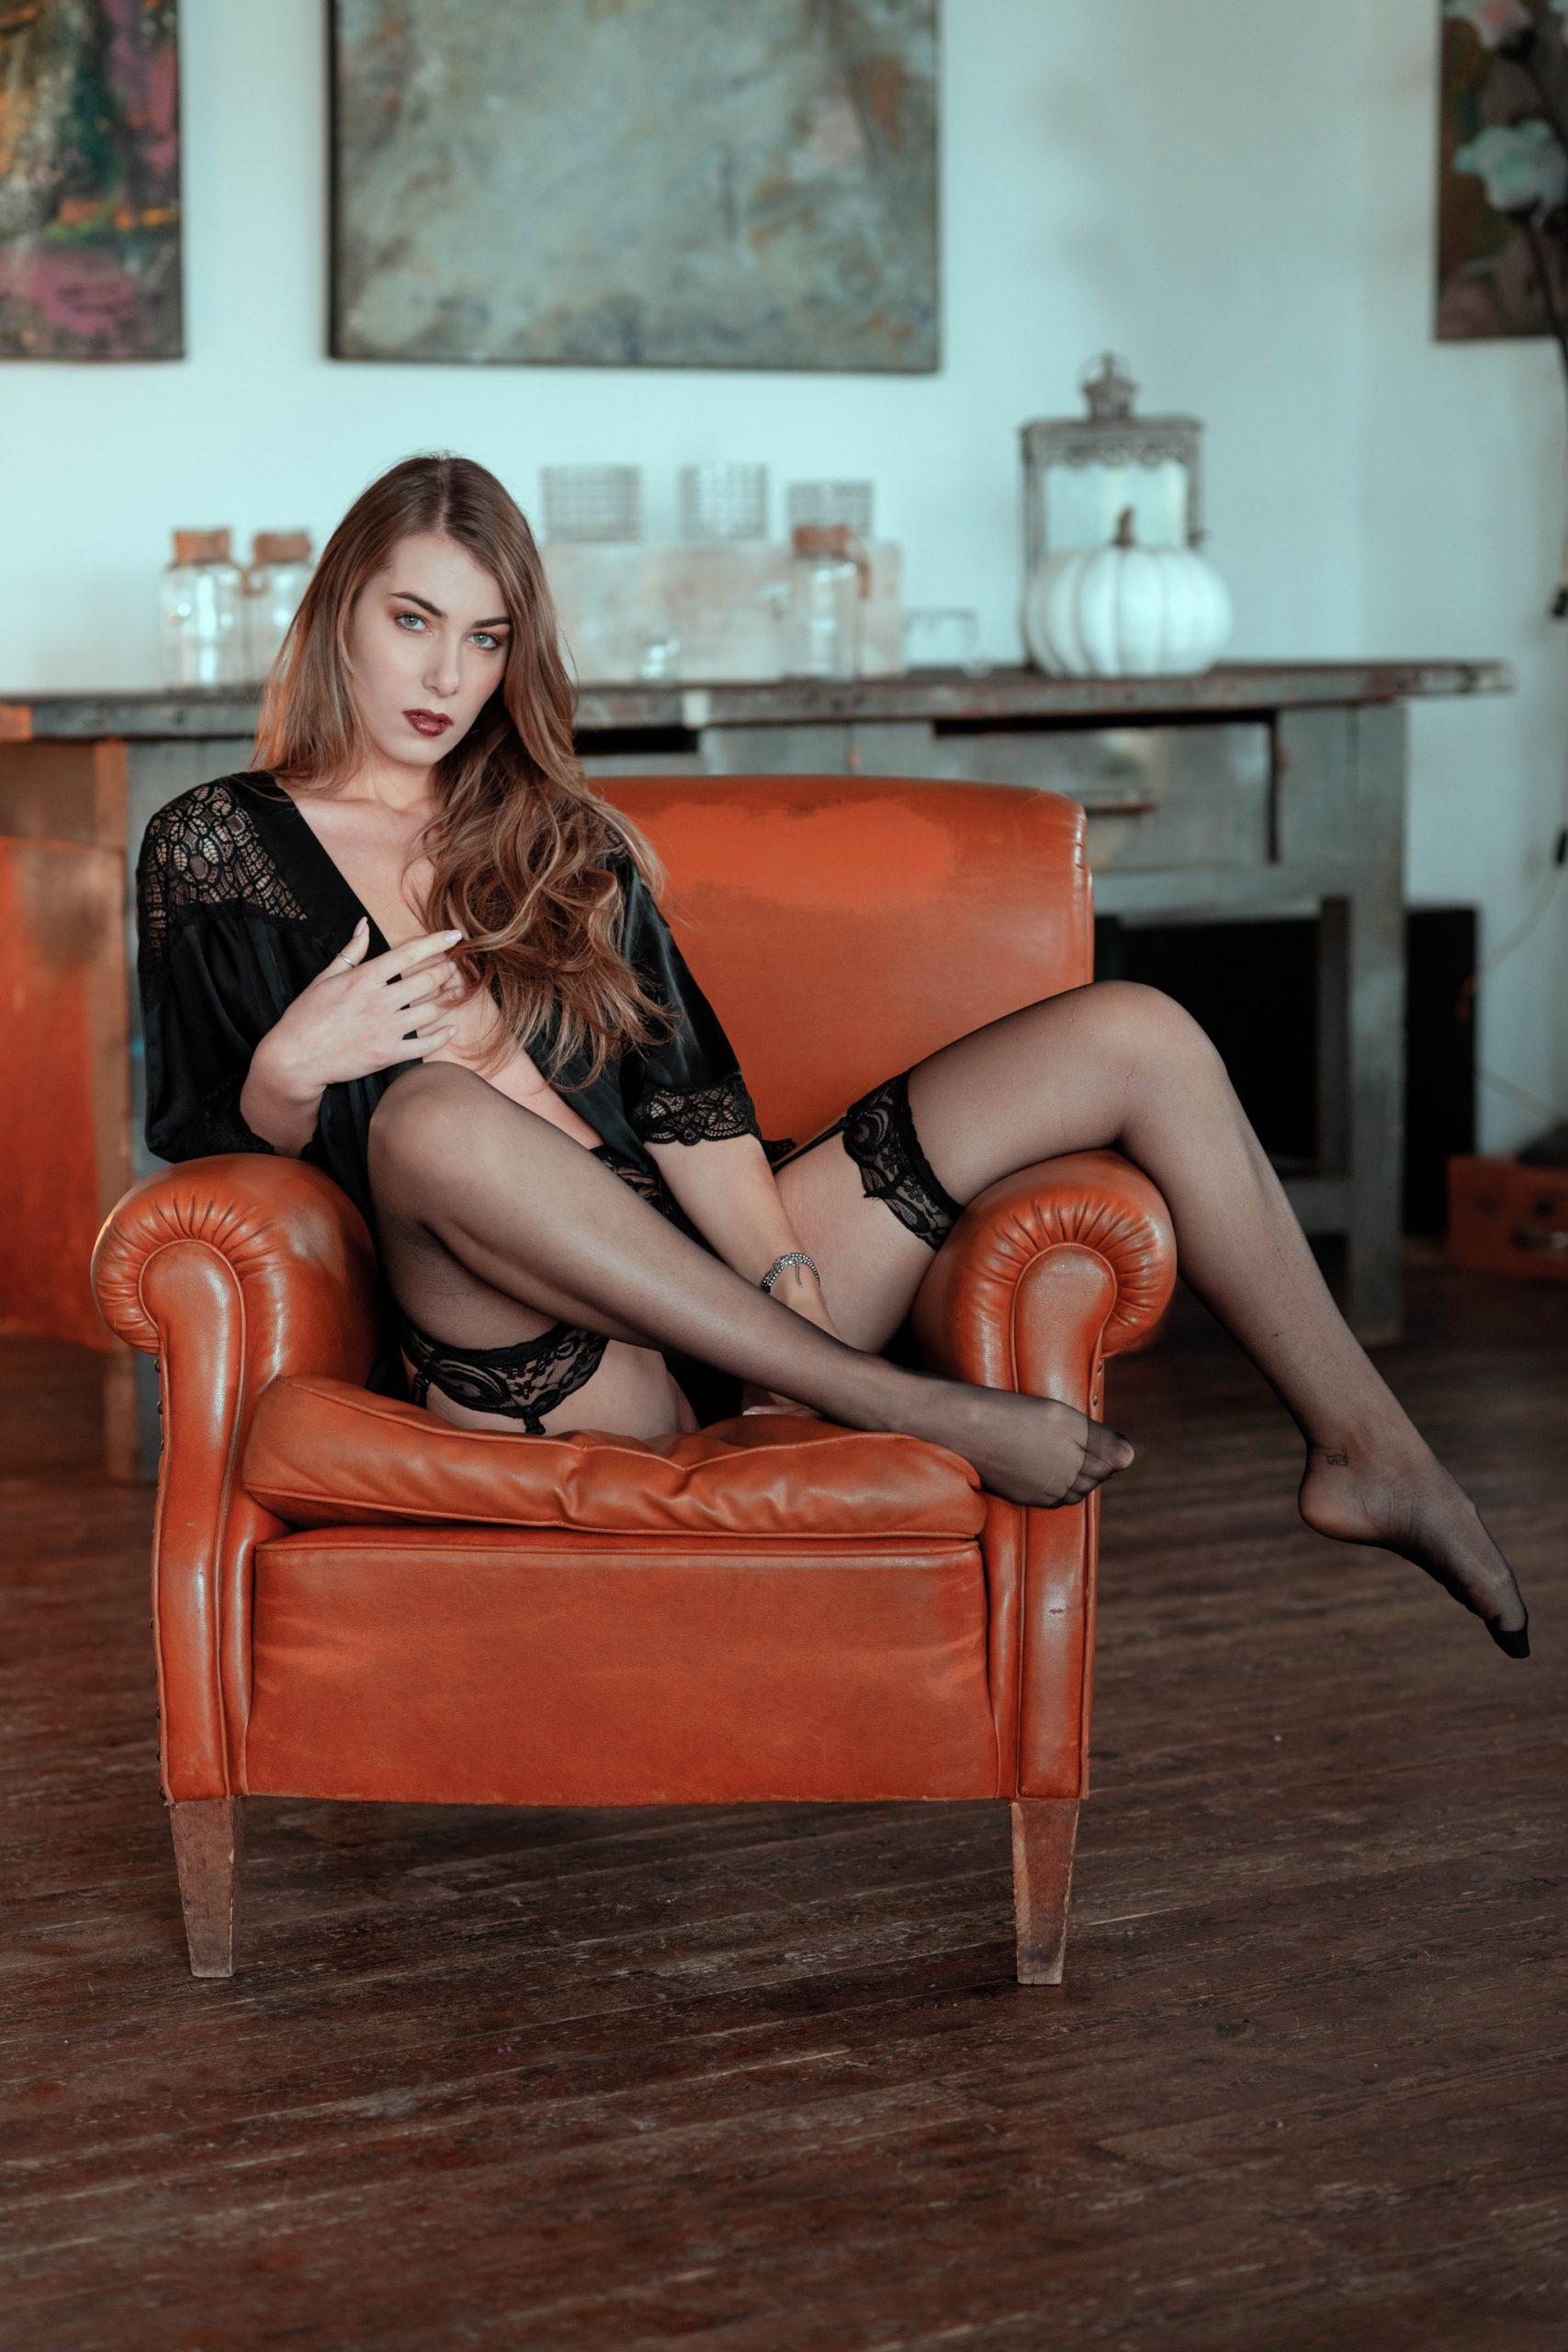 Categorie: Boudoir & Nude, Glamour, Portrait; Photographer: GIULIO IRVING; Model: ALESSIA MARSEGLIA; Make-up: BARBARA KENPACHI; Location: Roma, RM, Italia